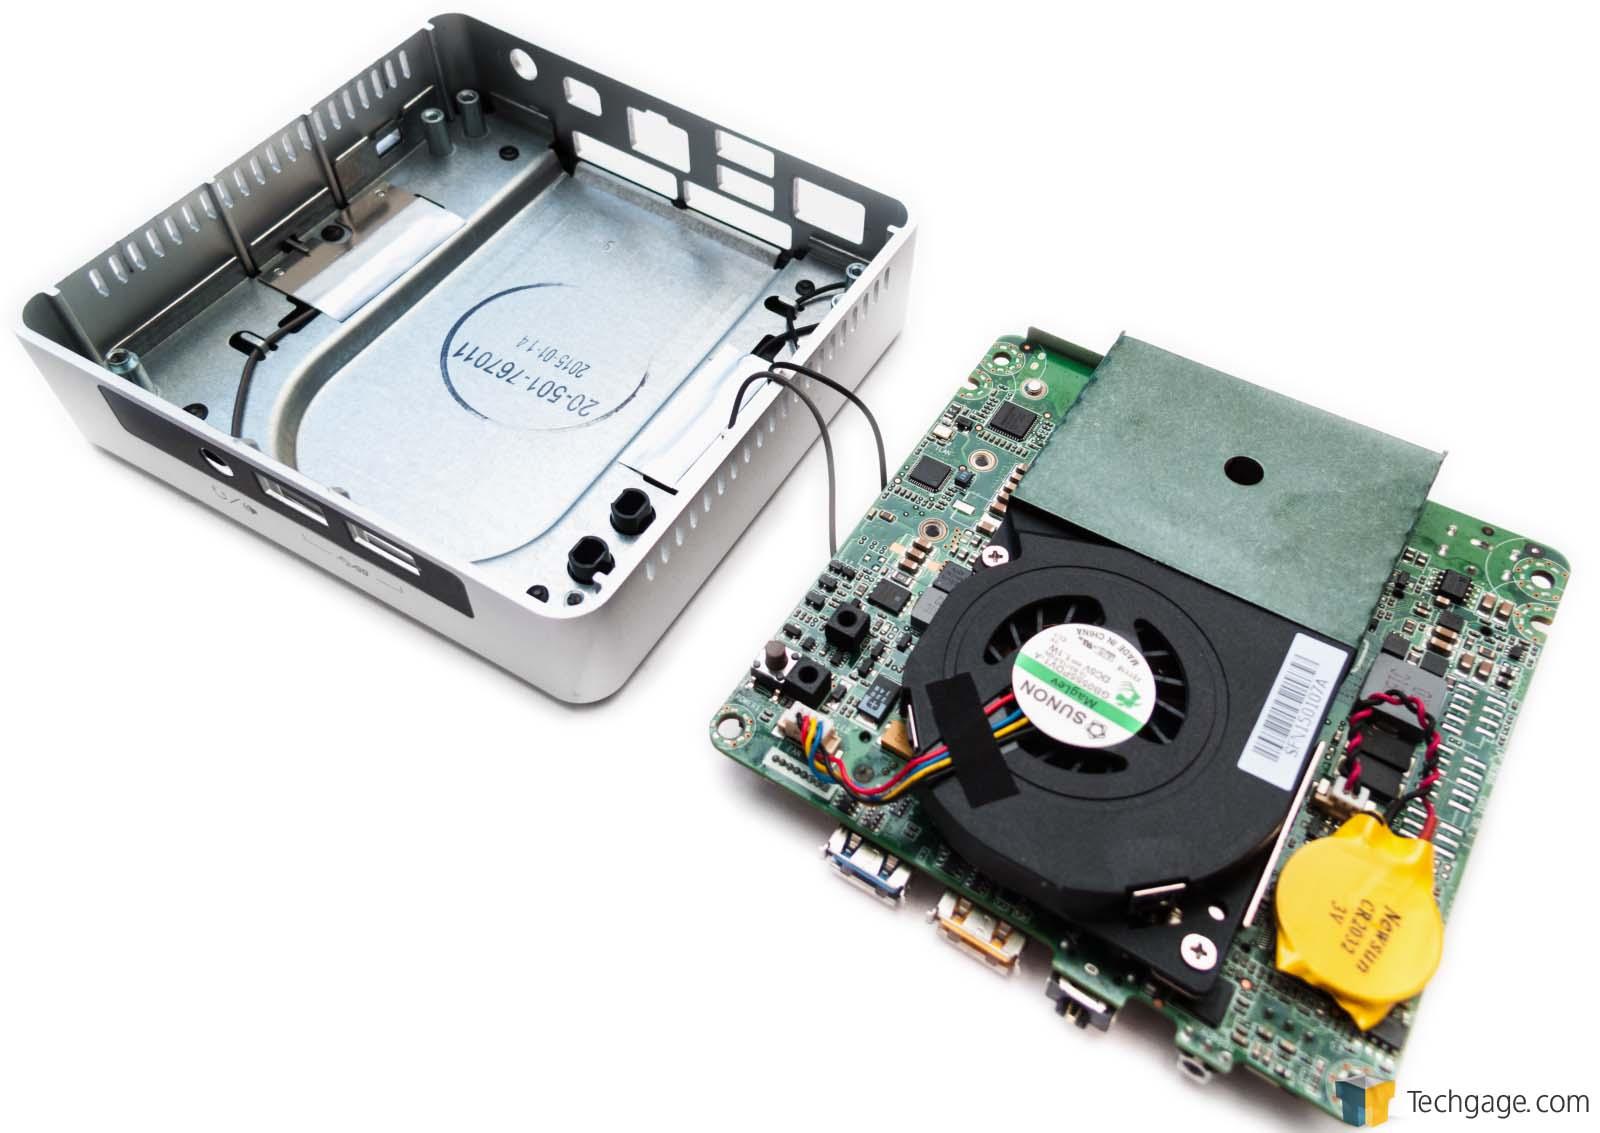 Small & Mighty – Intel NUC5i5RYK Mini PC Review – Techgage